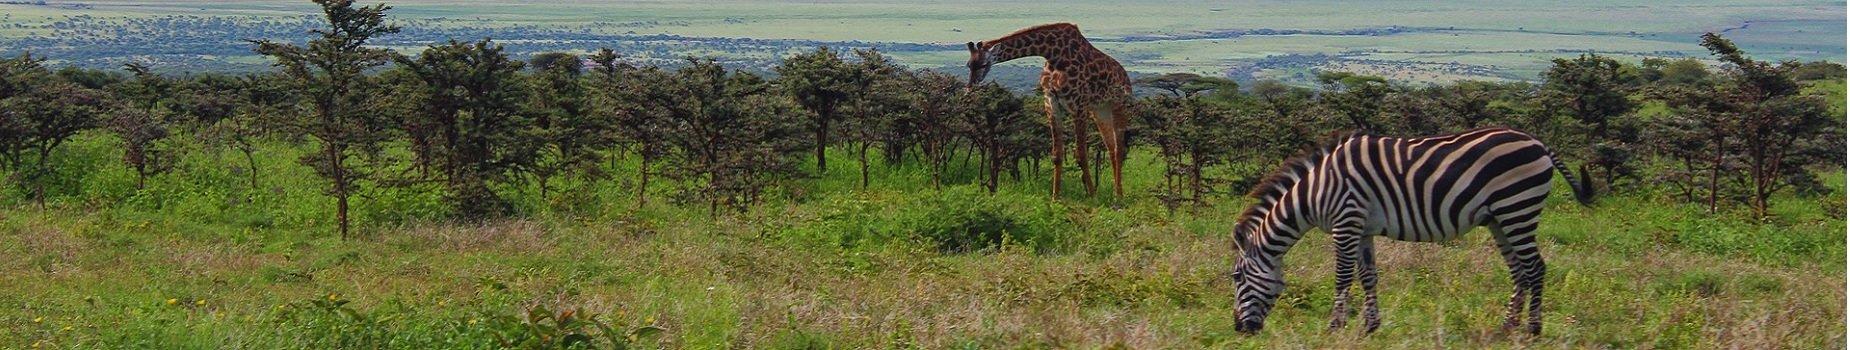 Vliegvelden Tanzania